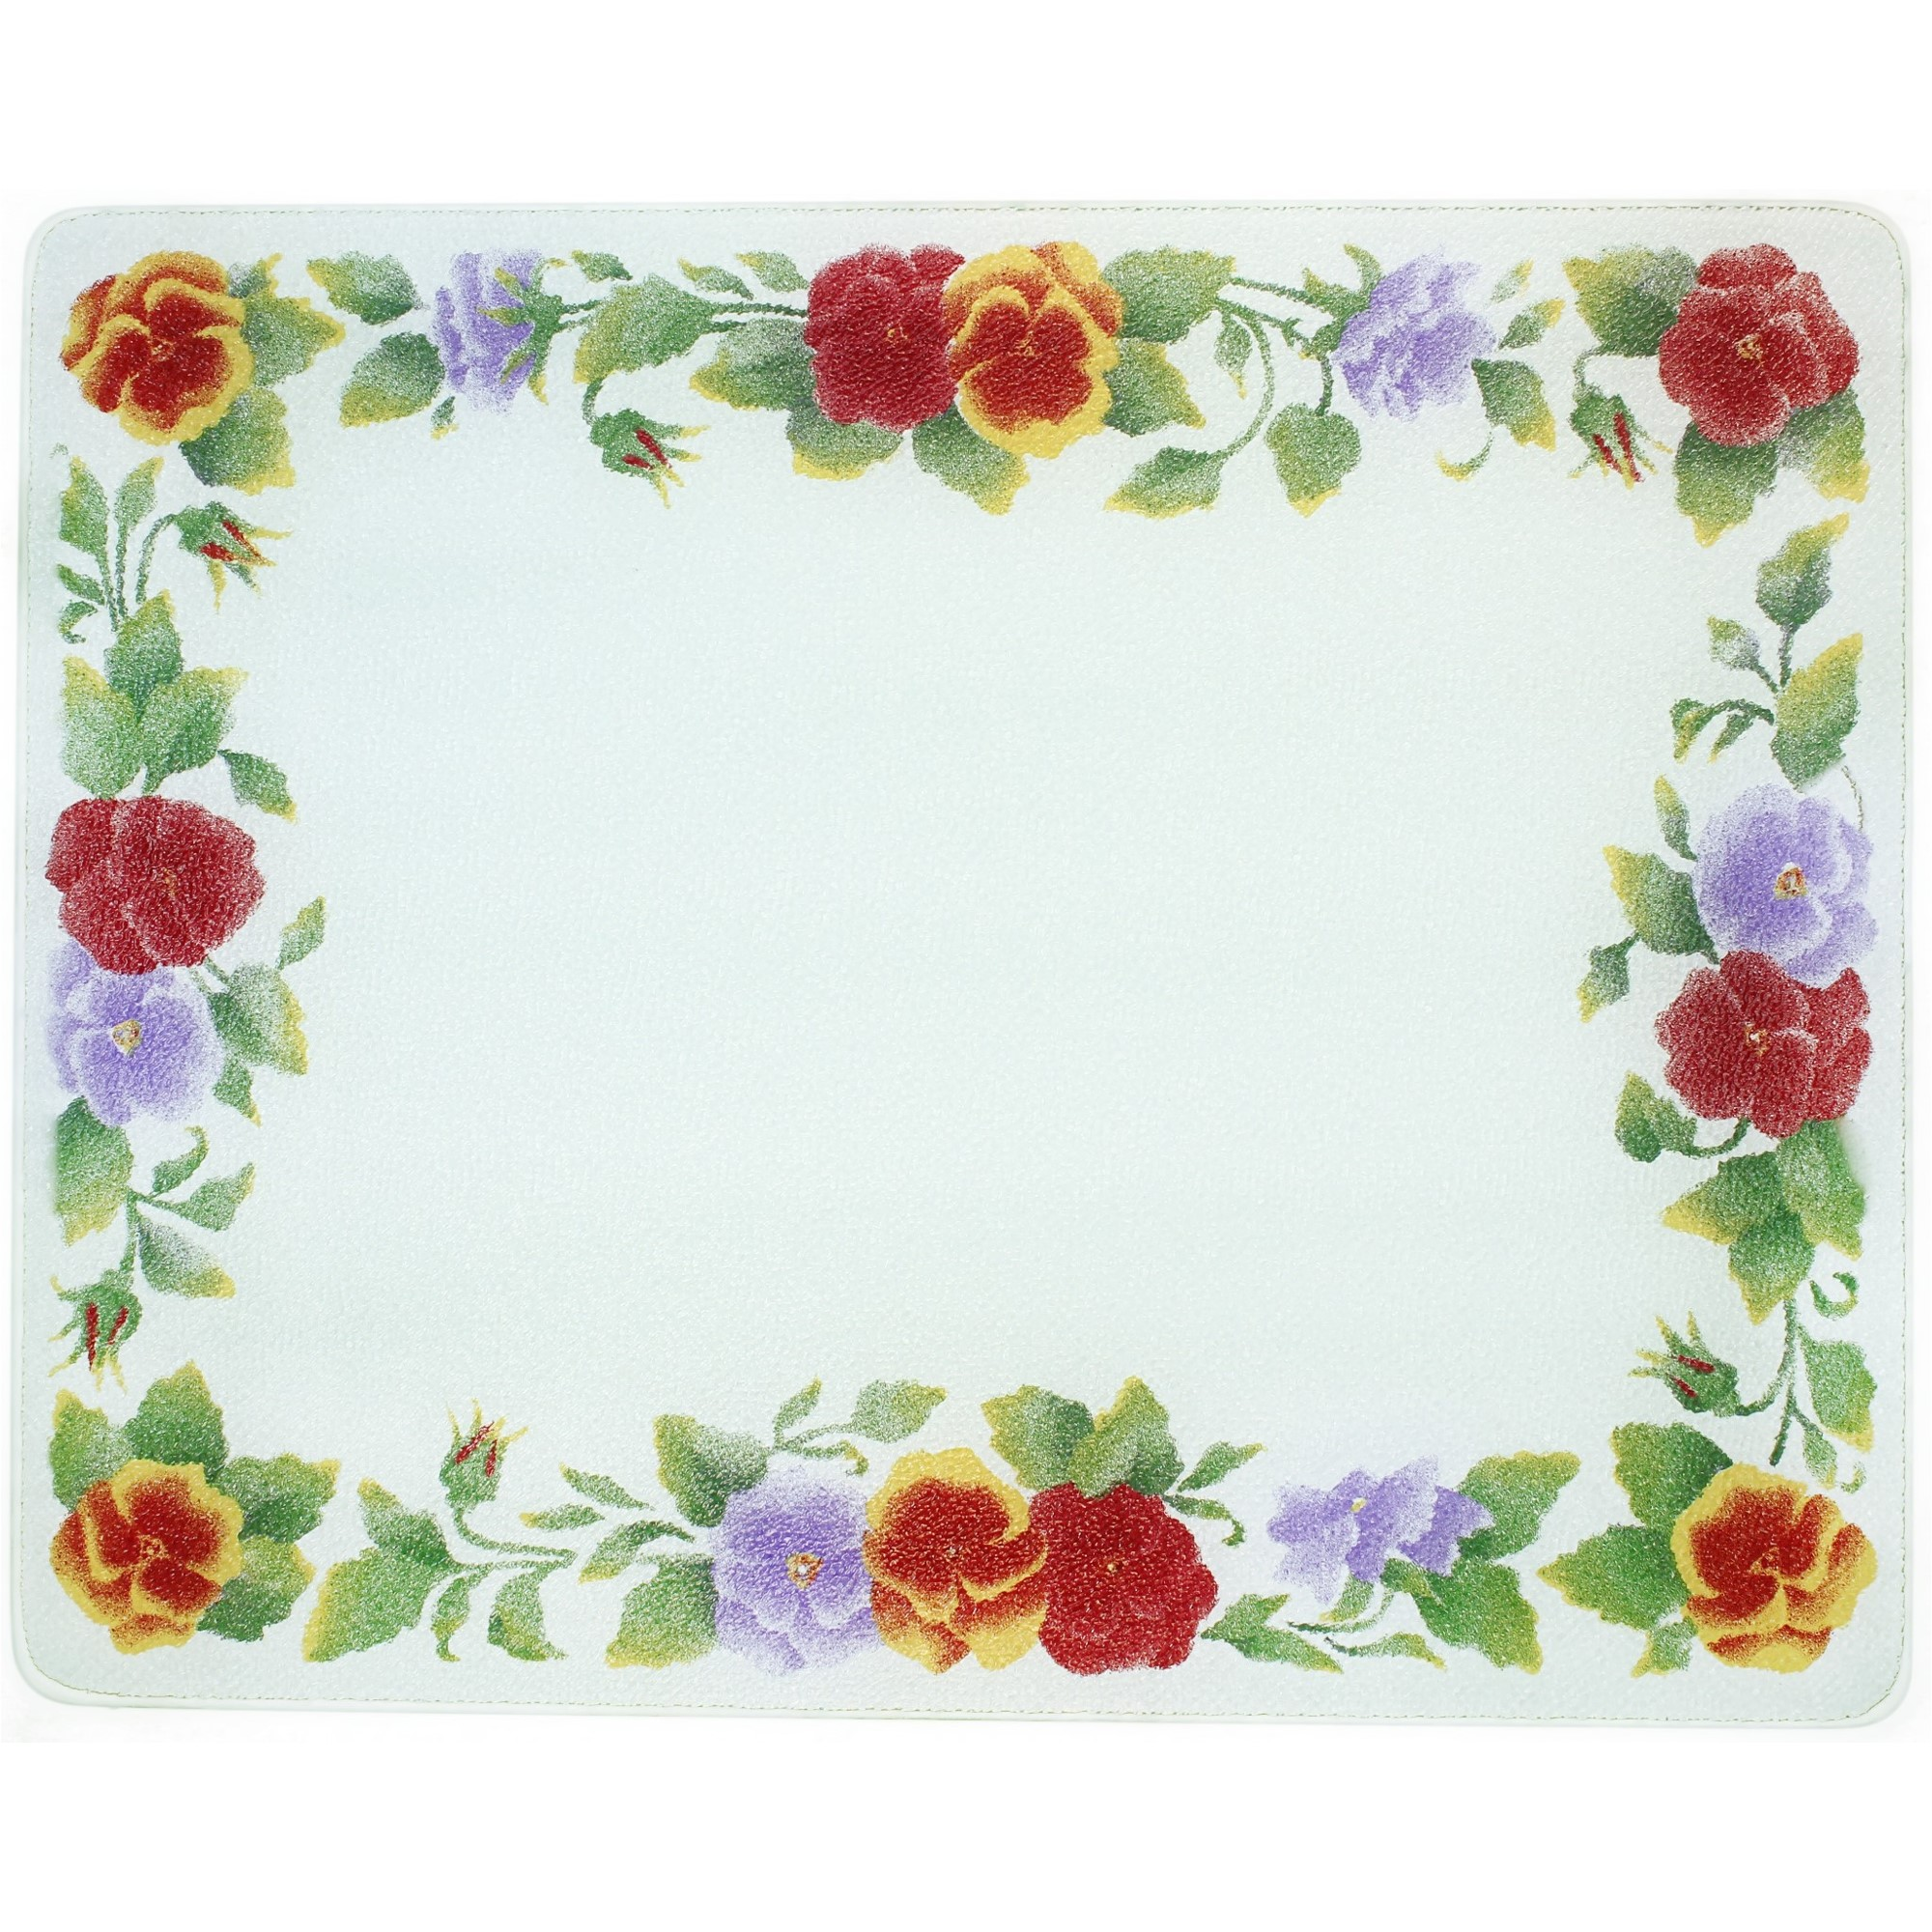 Corelle Summer Blush 20 X 16 inch Counter Saver Tempered Glass Cutting Board, 92016SMBH